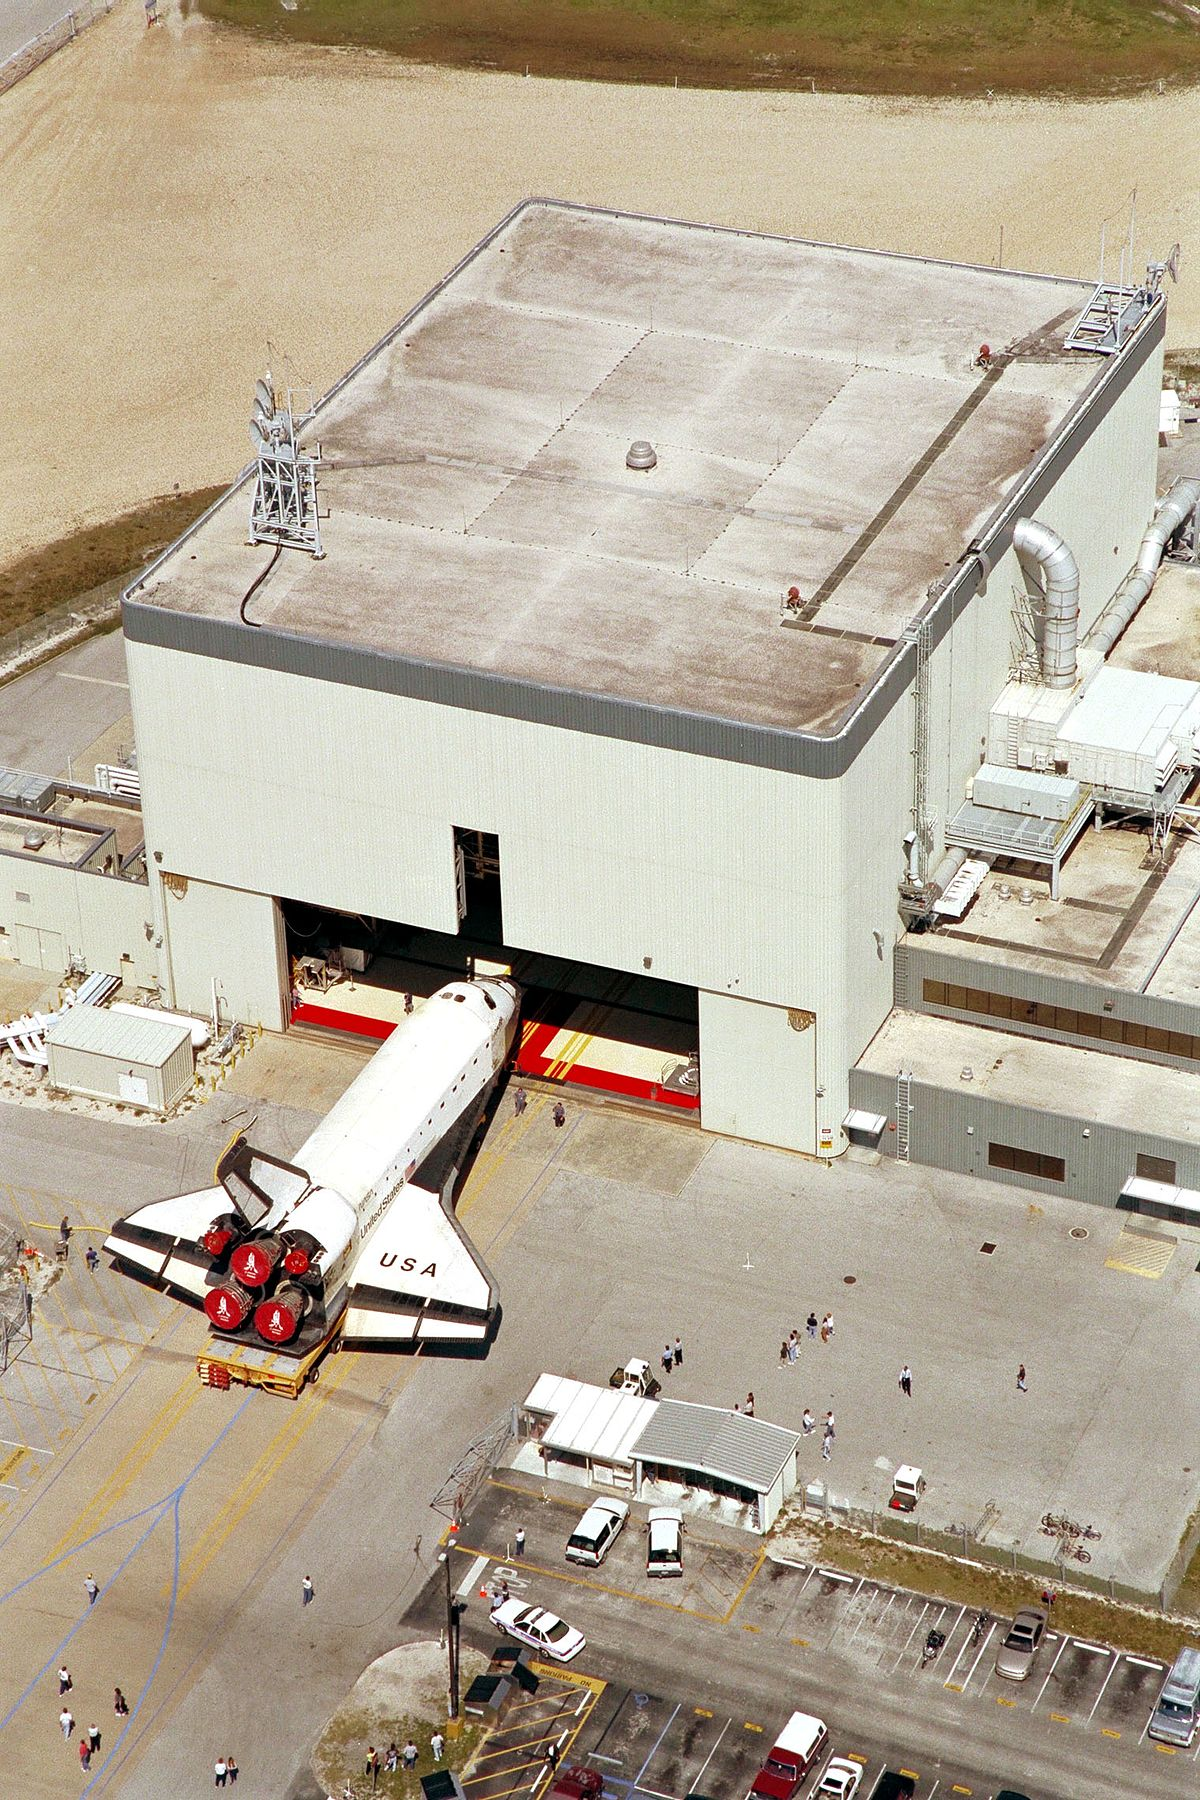 orbiter processing facility wikipedia